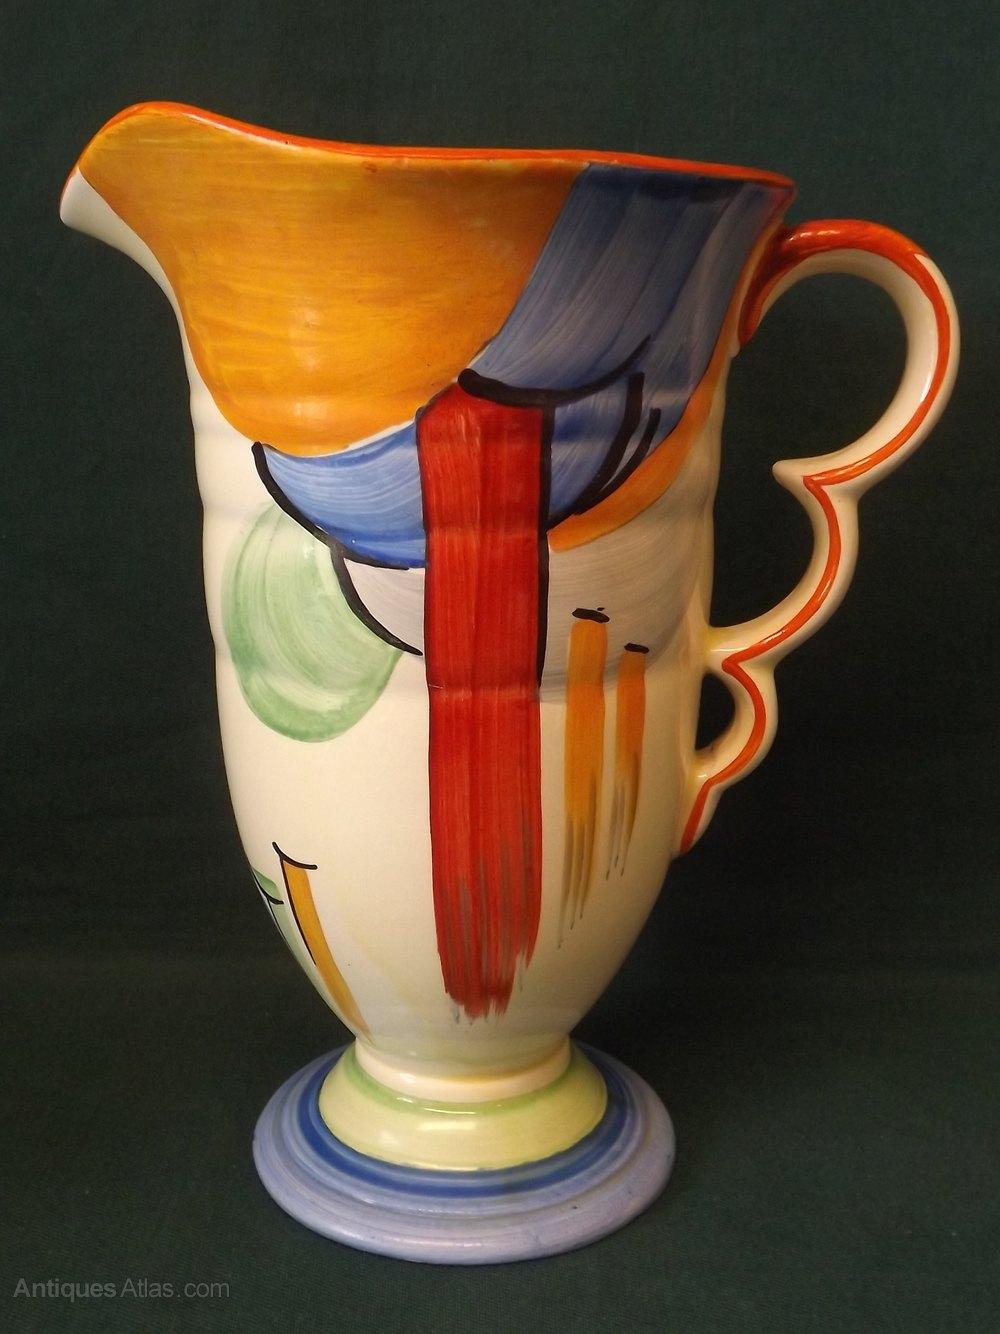 Antiques atlas art deco beswick pottery jug art deco beswick pottery jug reviewsmspy